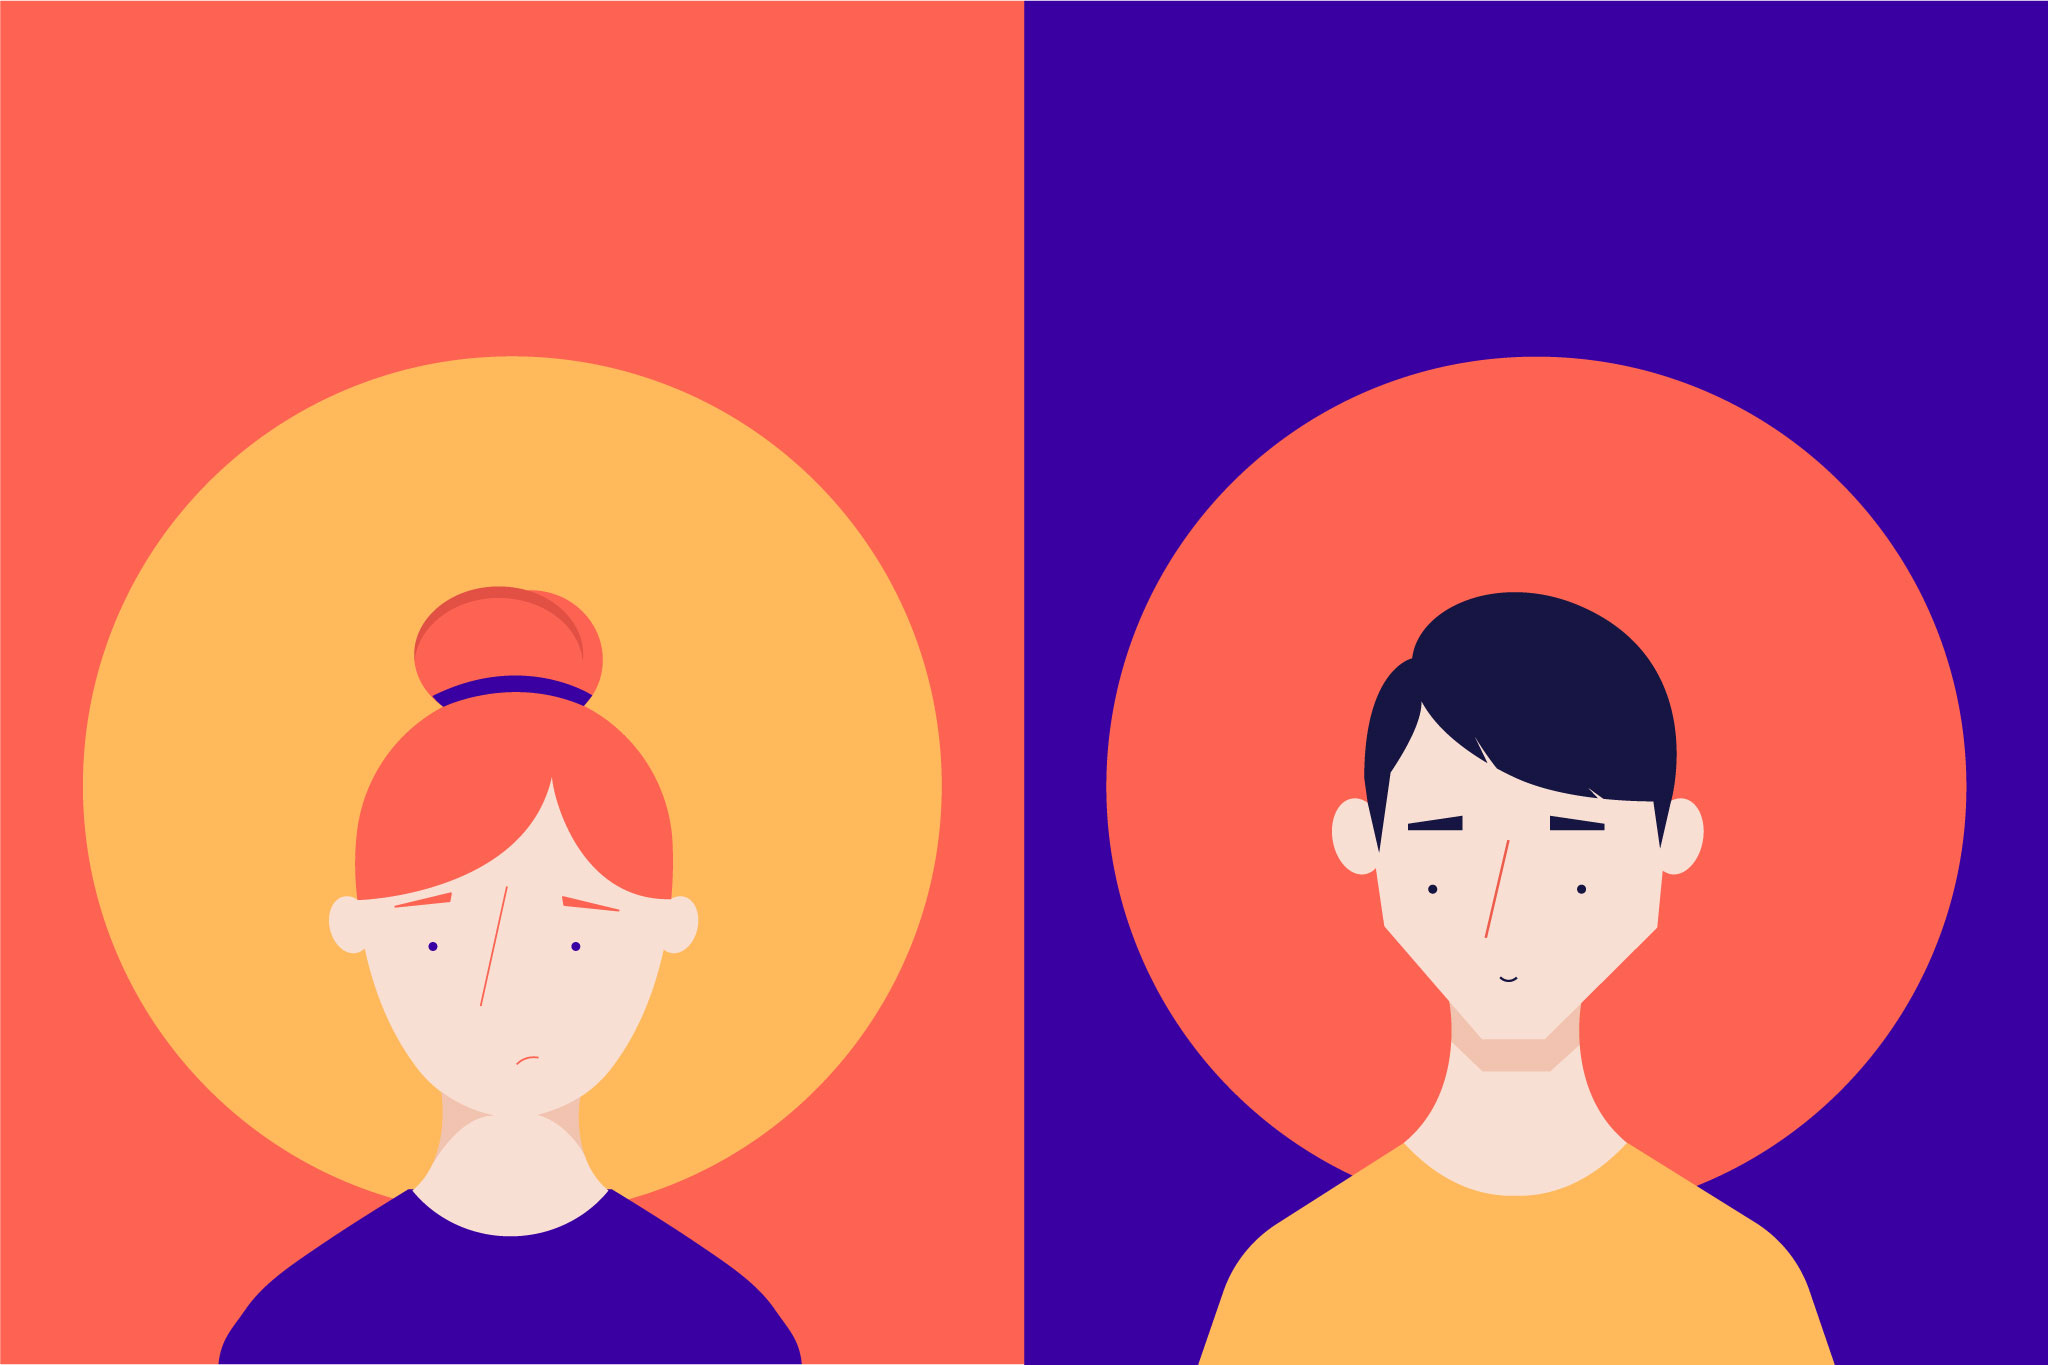 Coronavirus Elearning Characters illustrated for Árbol Creative Studio